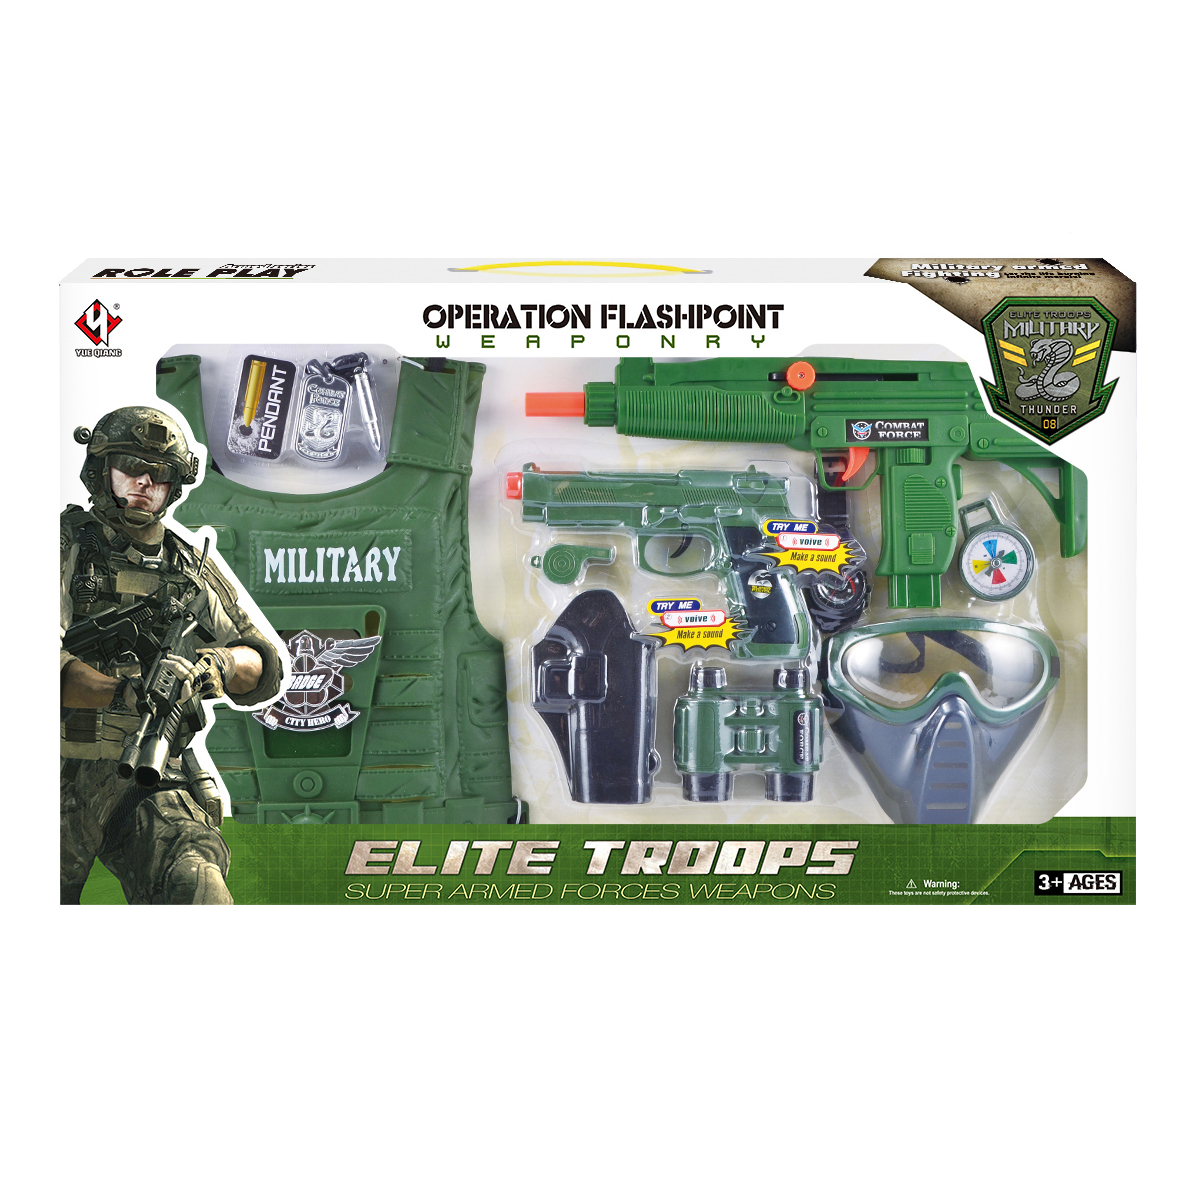 Set accesorii armata Military Thunders, 10 piese imagine